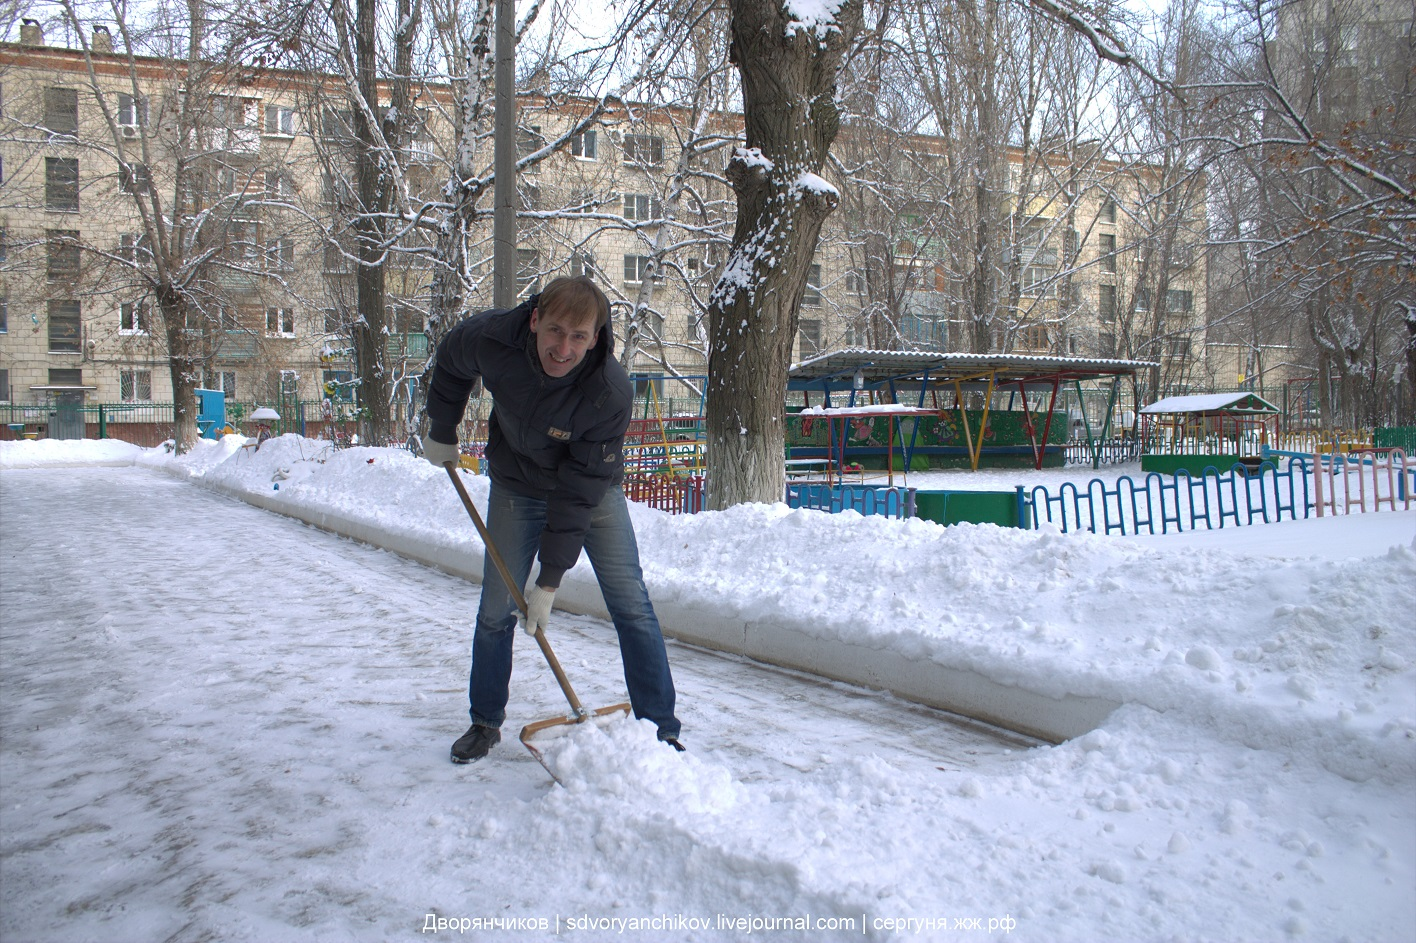 Чистим снег сами - снегоуборочная машина Волгоград 2017 - терминатор